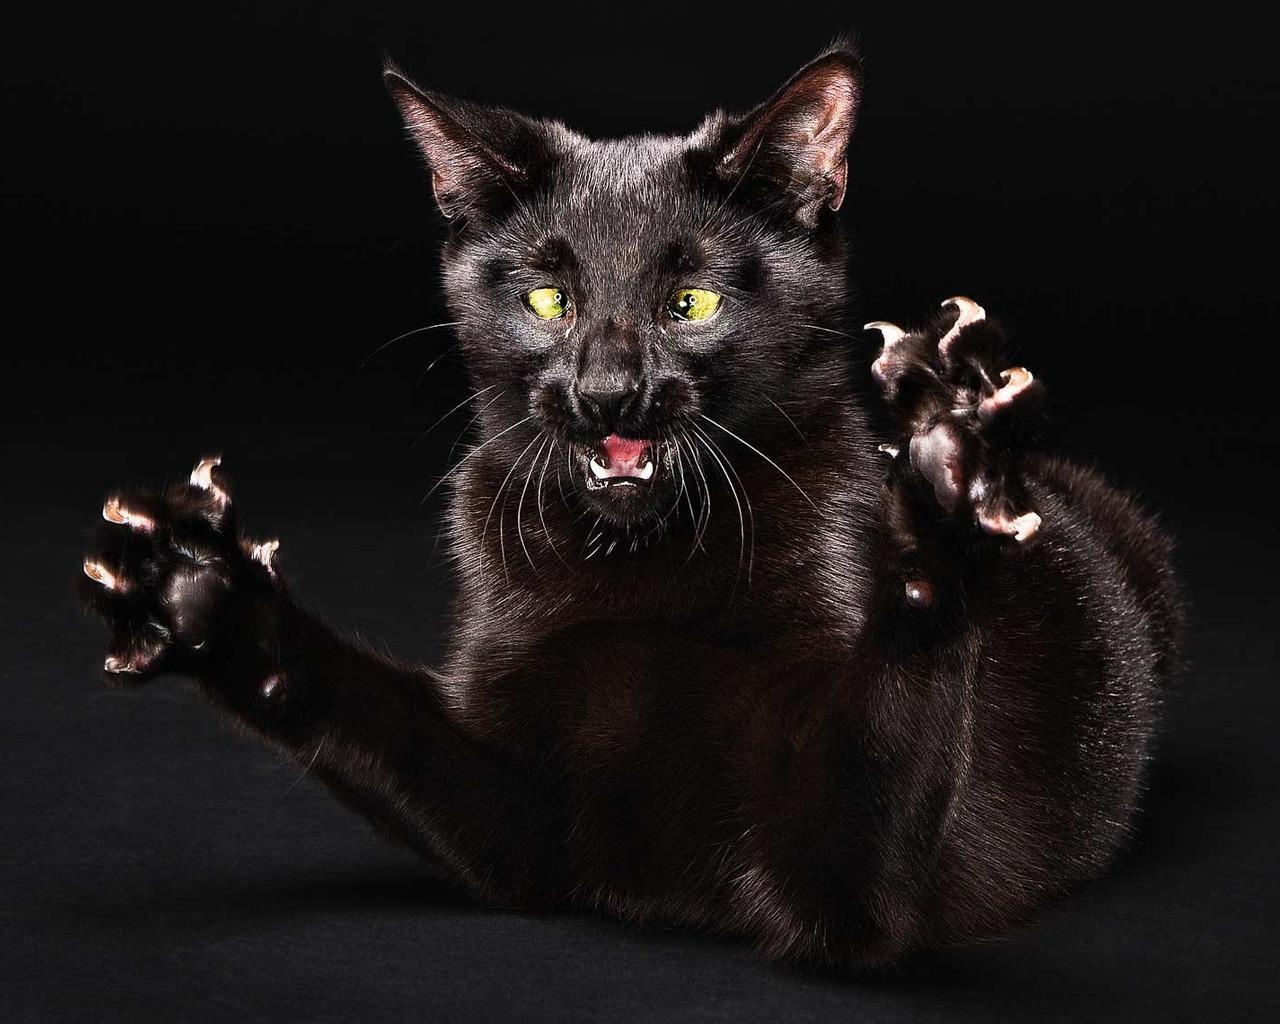 Черная кошка с когтями, кошки, фото, обои